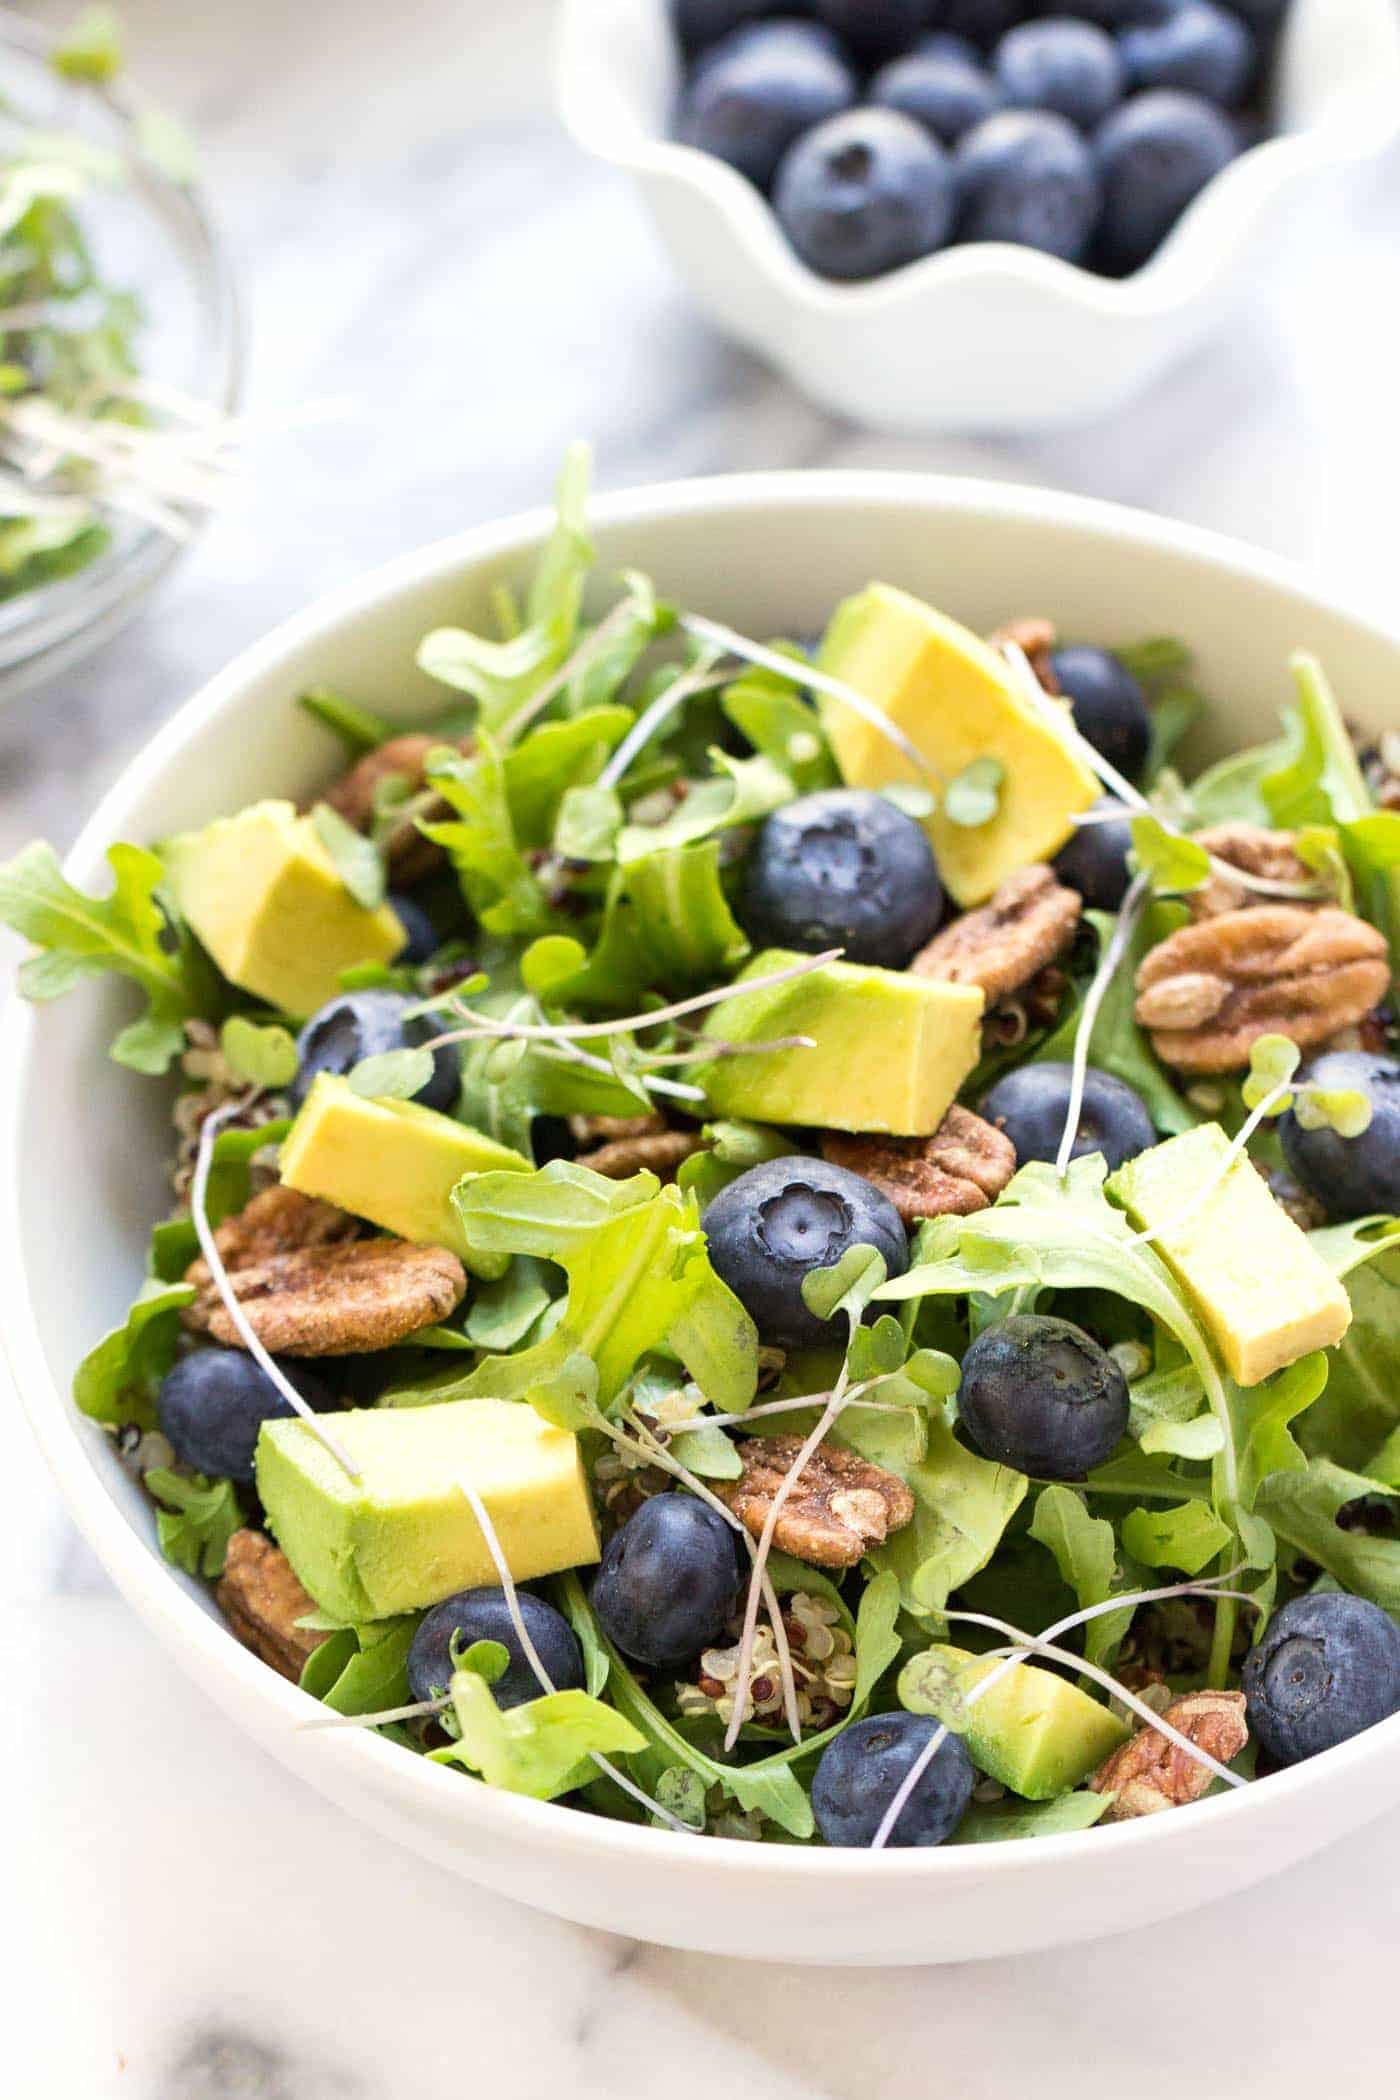 Blueberry Quinoa Power Salad -- with arugula, blueberries, quinoa, pecans, avocado + microgreens!